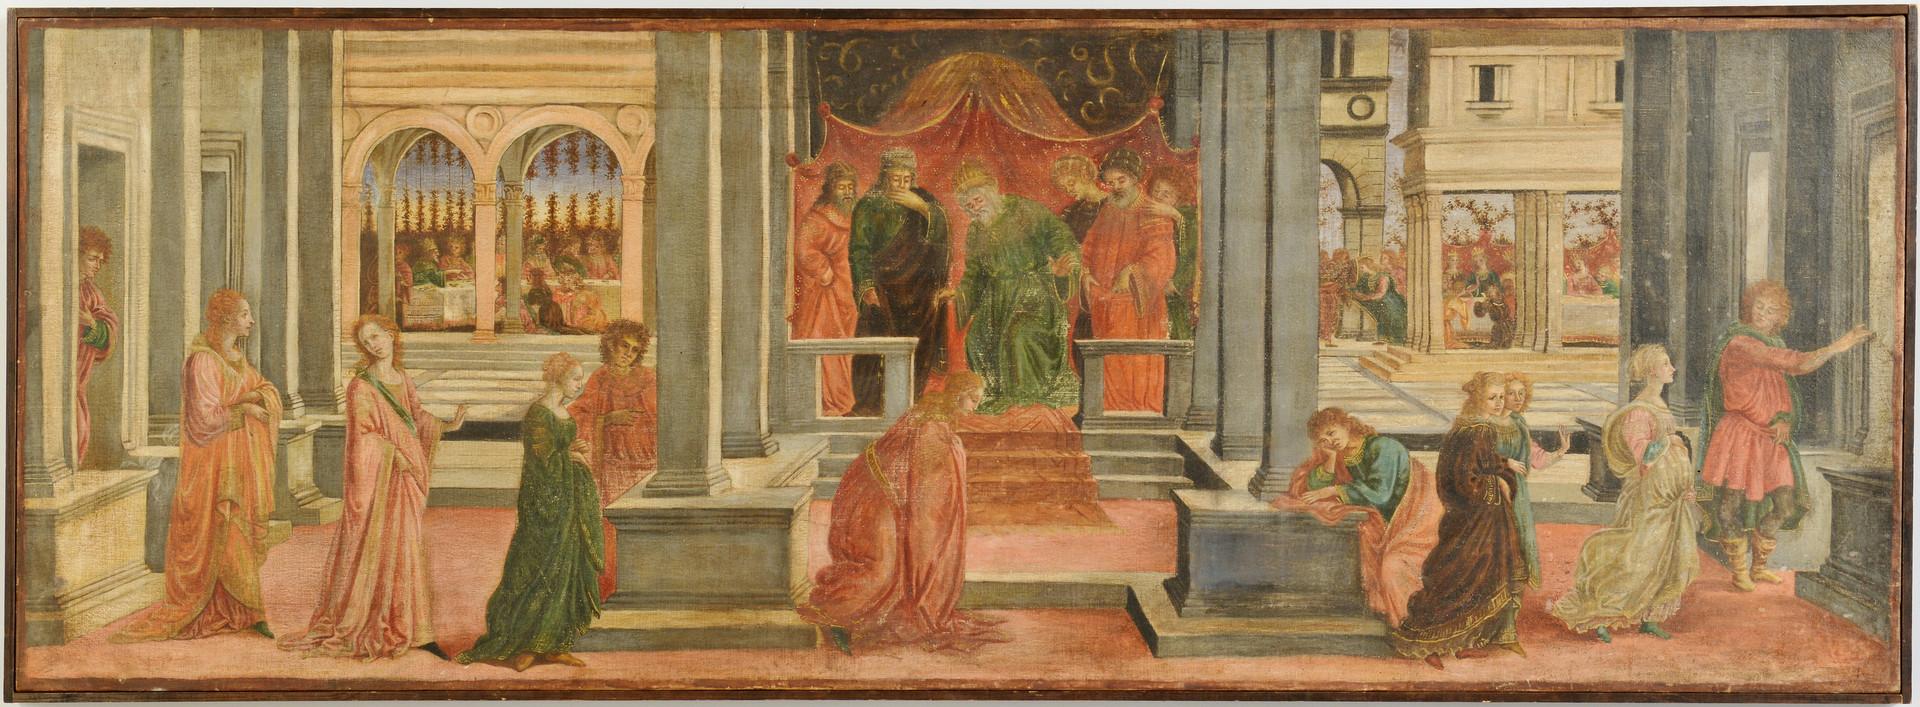 Lot 850: Italian School o/c, Queen Esther